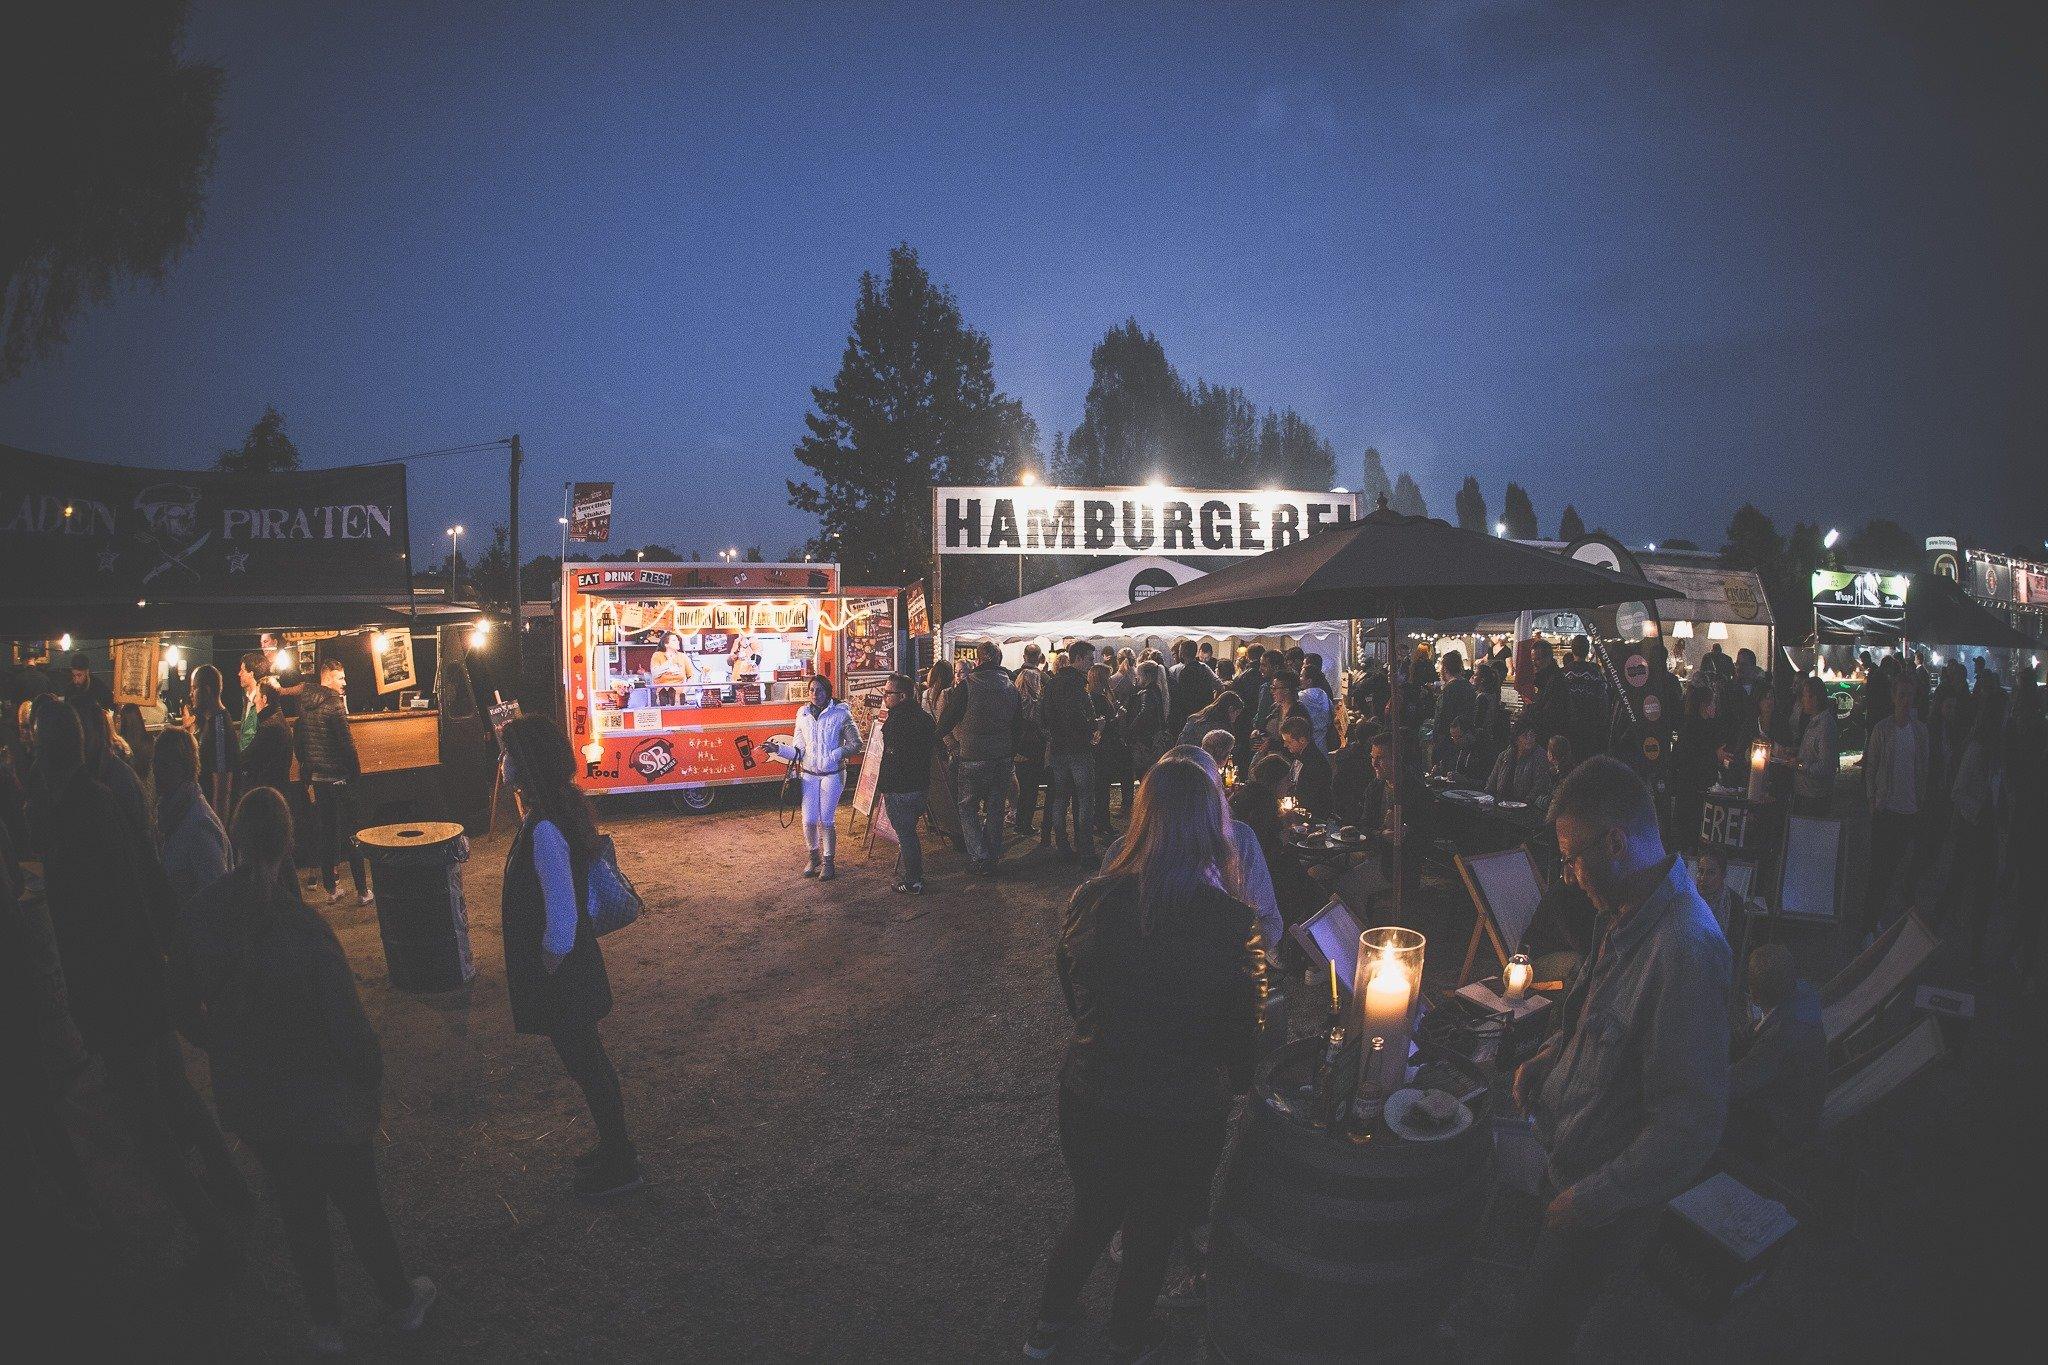 hamburg 10 2017 street food schmeckfestival. Black Bedroom Furniture Sets. Home Design Ideas